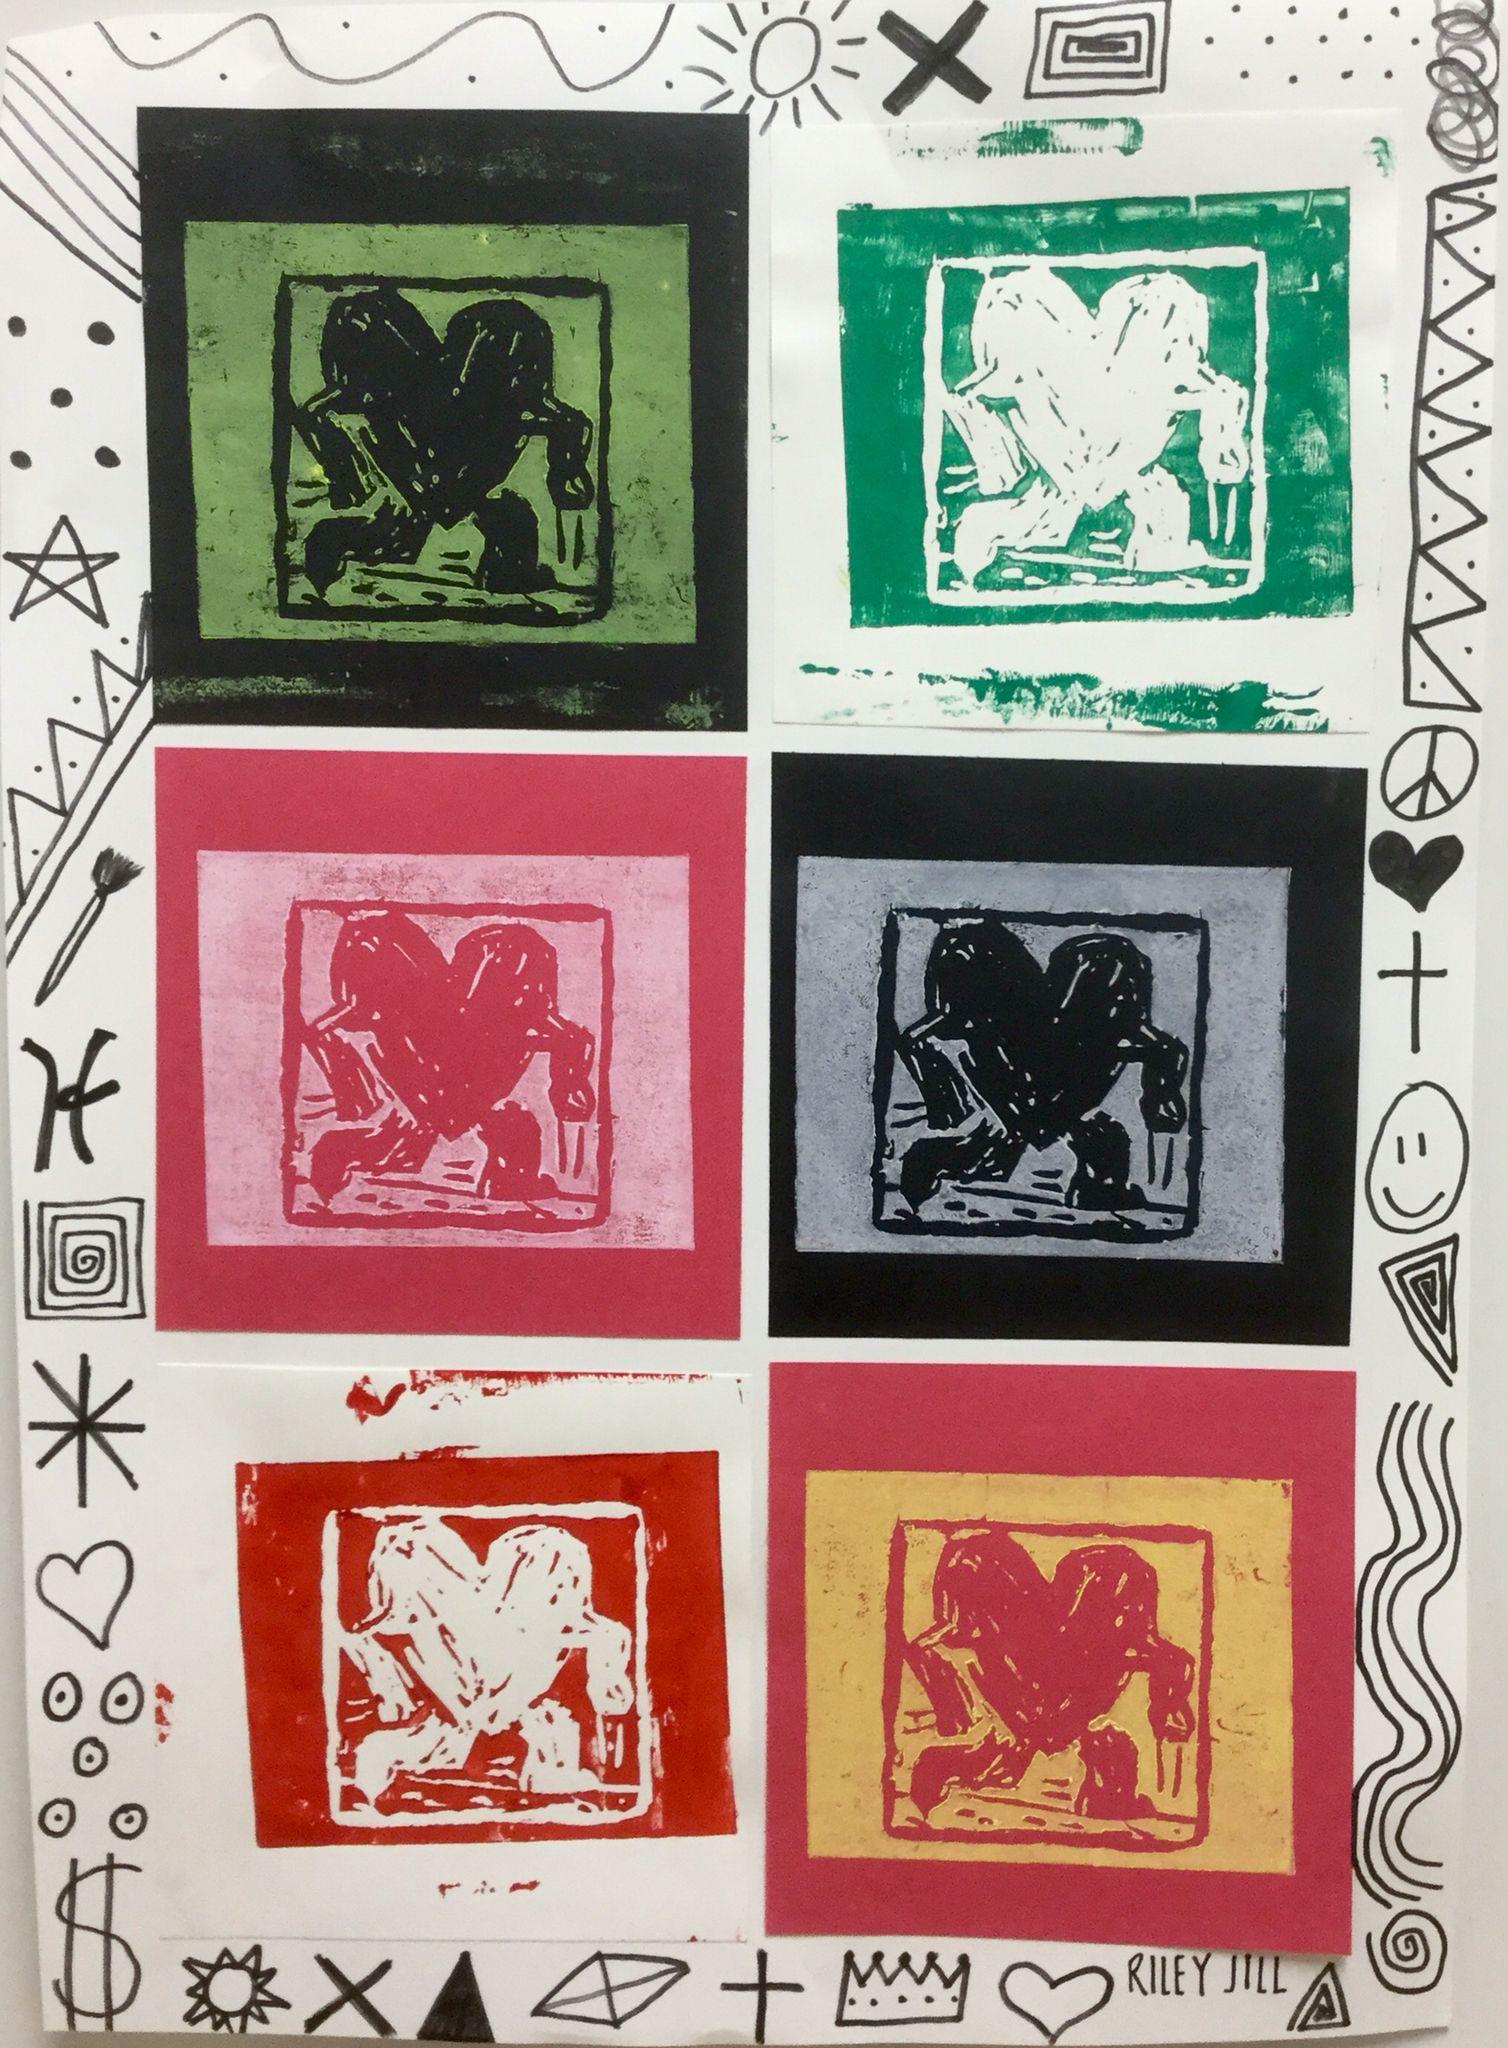 8th Grade Keith Haring Printmaking 2soulsisters